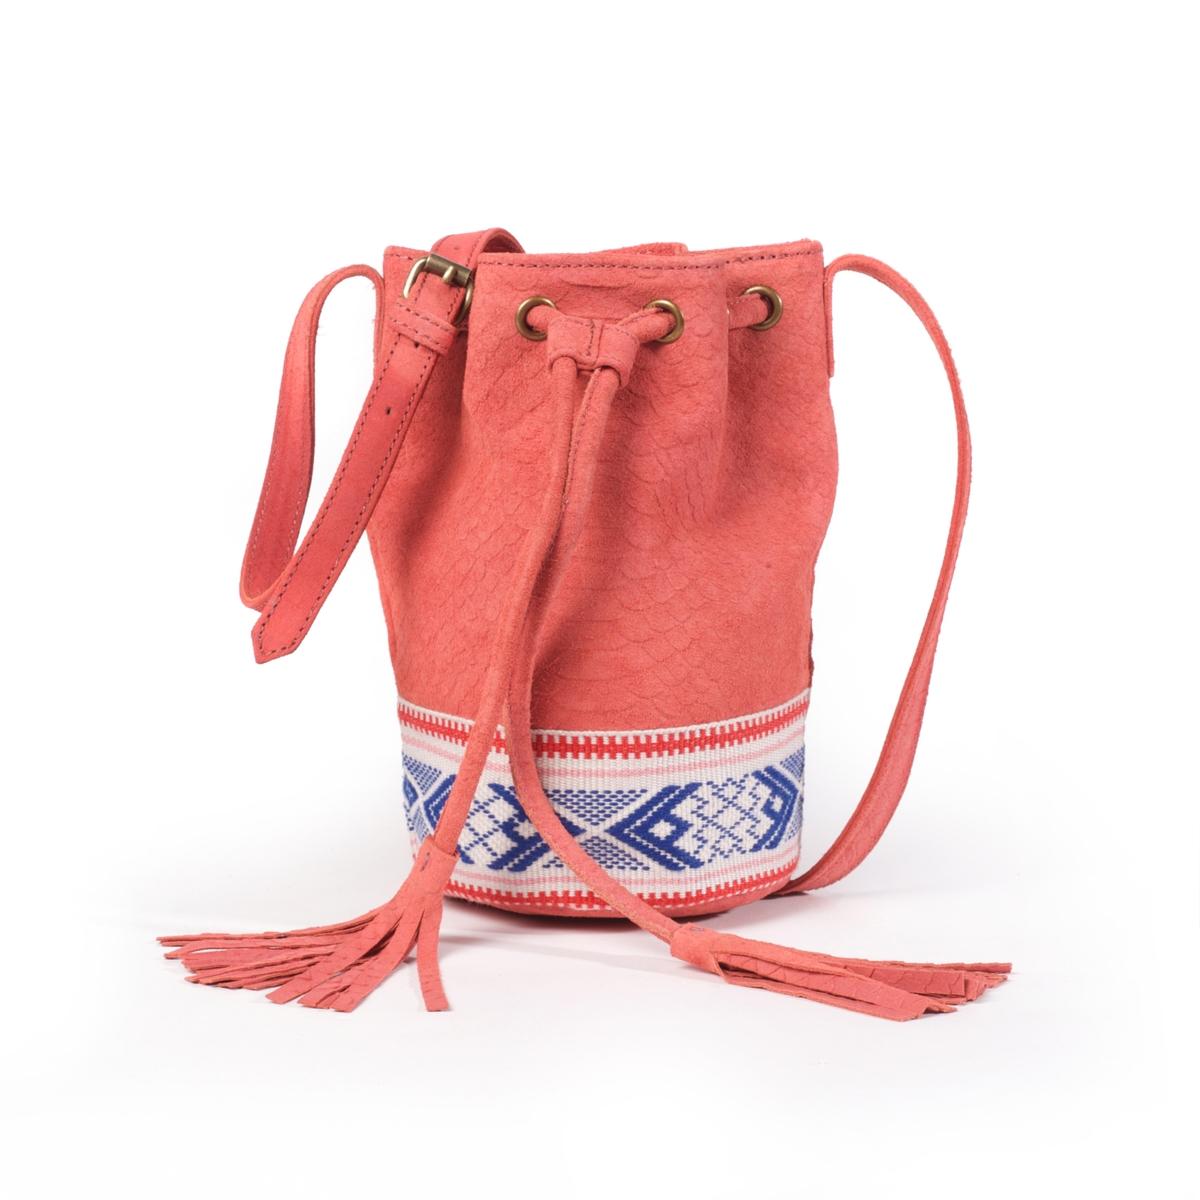 Сумка-мешок La Redoute Из кожи с этническим рисунком UNI розовый наволочка la redoute из хлопковой перкали aricha 50 x 70 см розовый